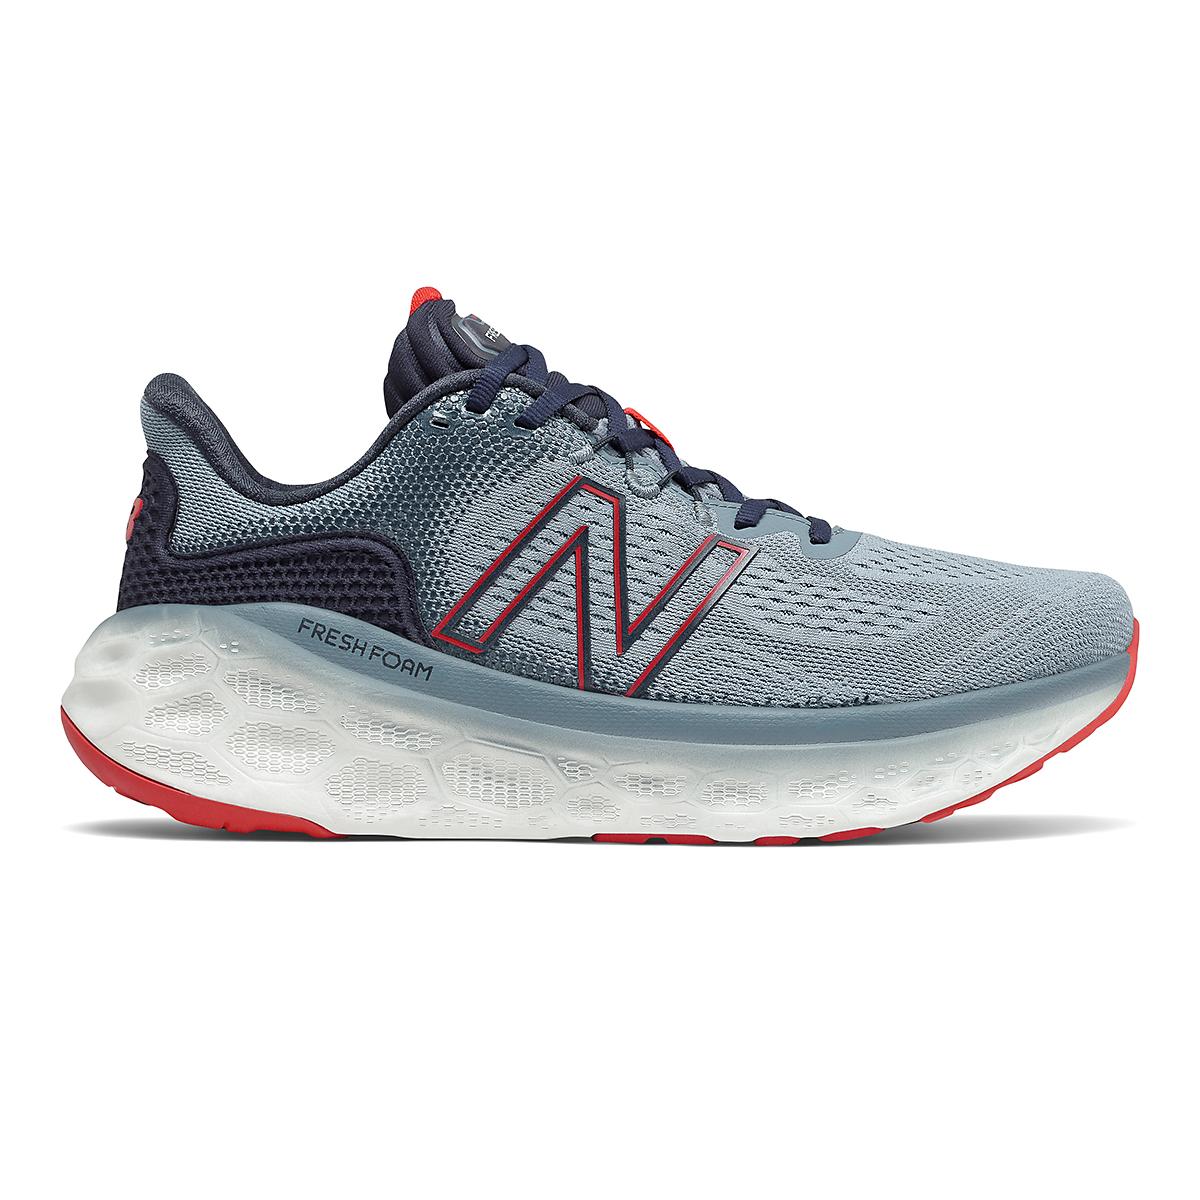 Men's New Balance Fresh Foam More V3 Running Shoe - Color: Ocean Grey/Velocity Red/Eclipse/Virtual Sky - Size: 7 - Width: Wide, Ocean Grey/Velocity Red/Eclipse/Virtual Sky, large, image 1